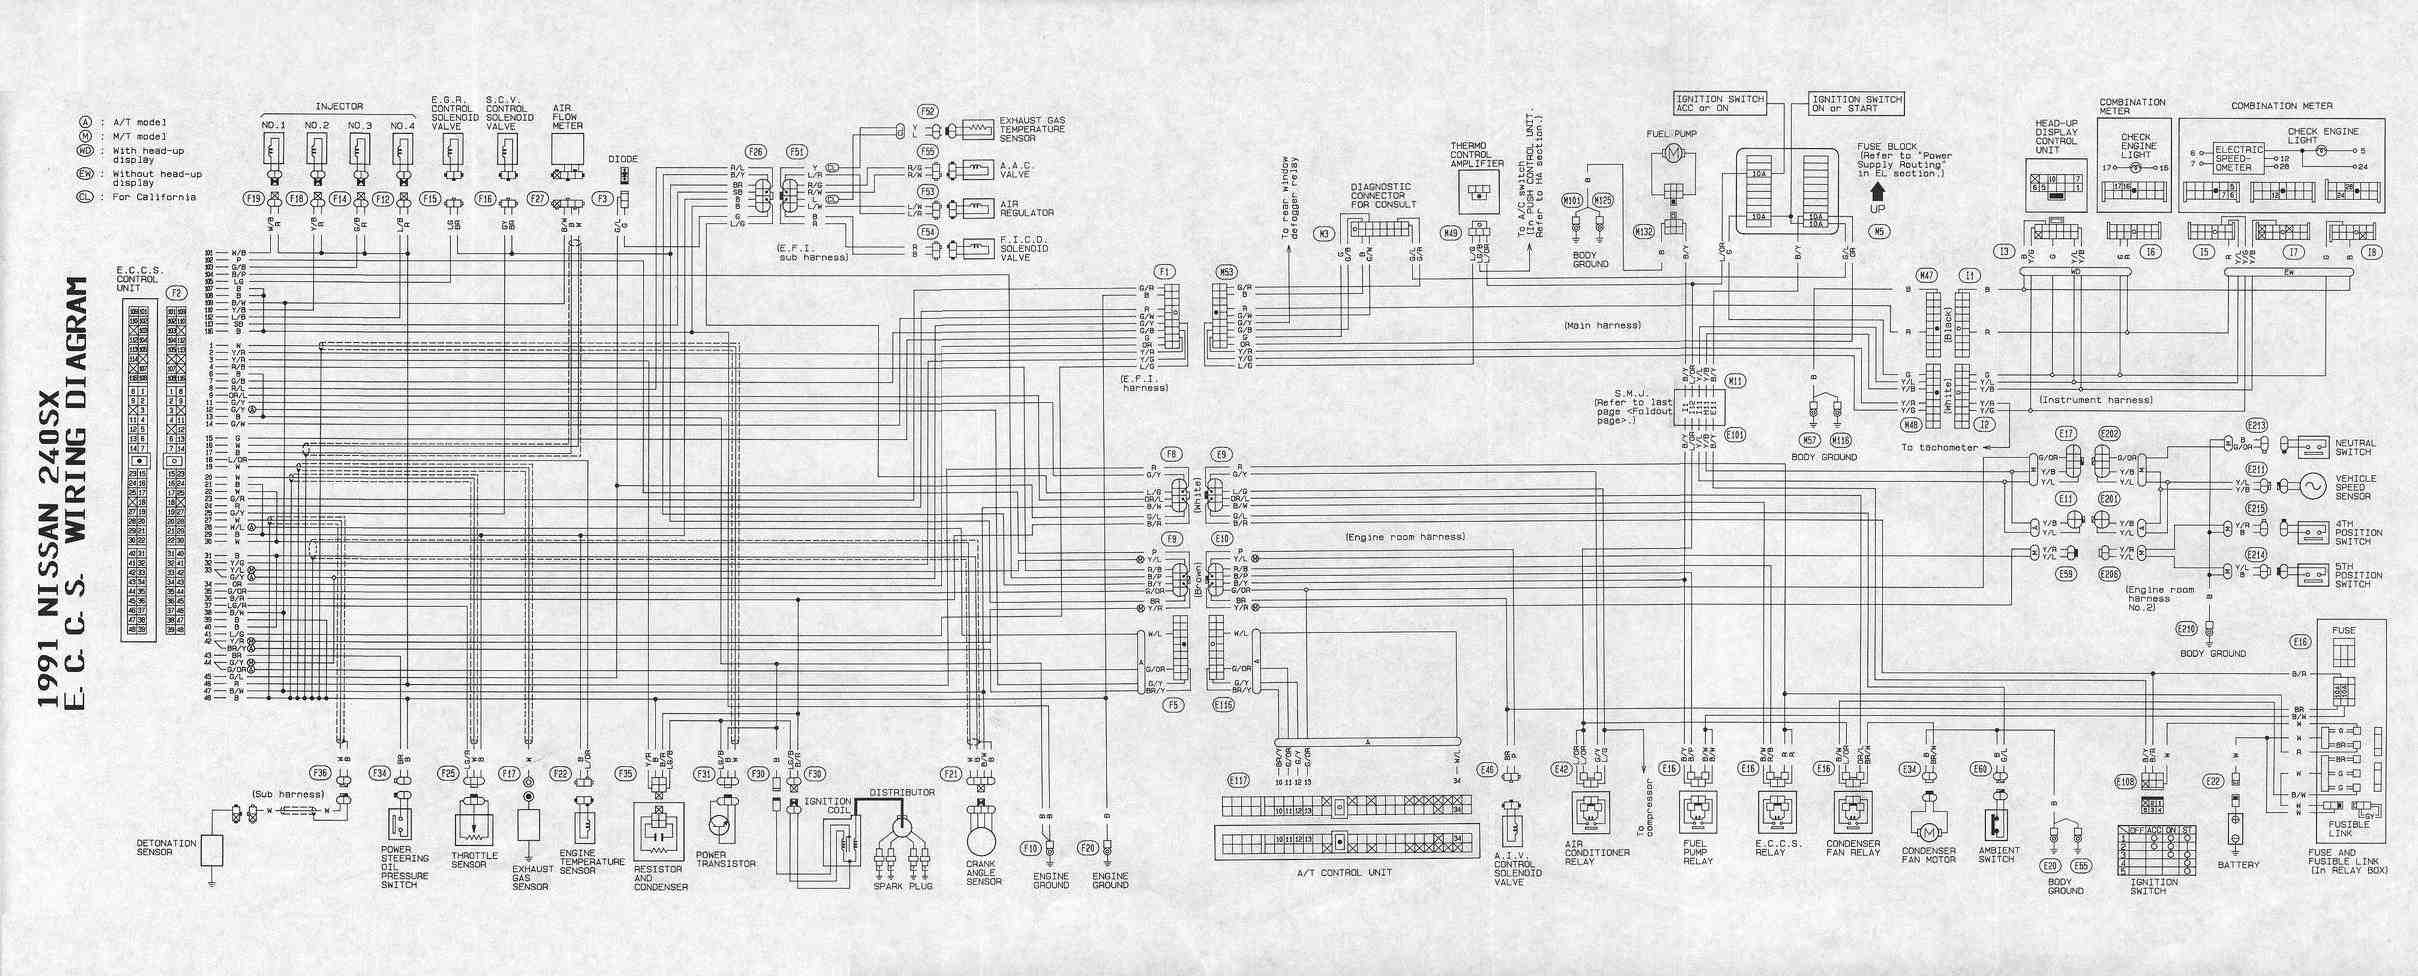 nissan juke stereo wiring diagram wiring diagram database Nissan Battery Diagram nissan juke radio wiring harness diagram circuit diagram template 2013 nissan juke radio wiring diagram nissan